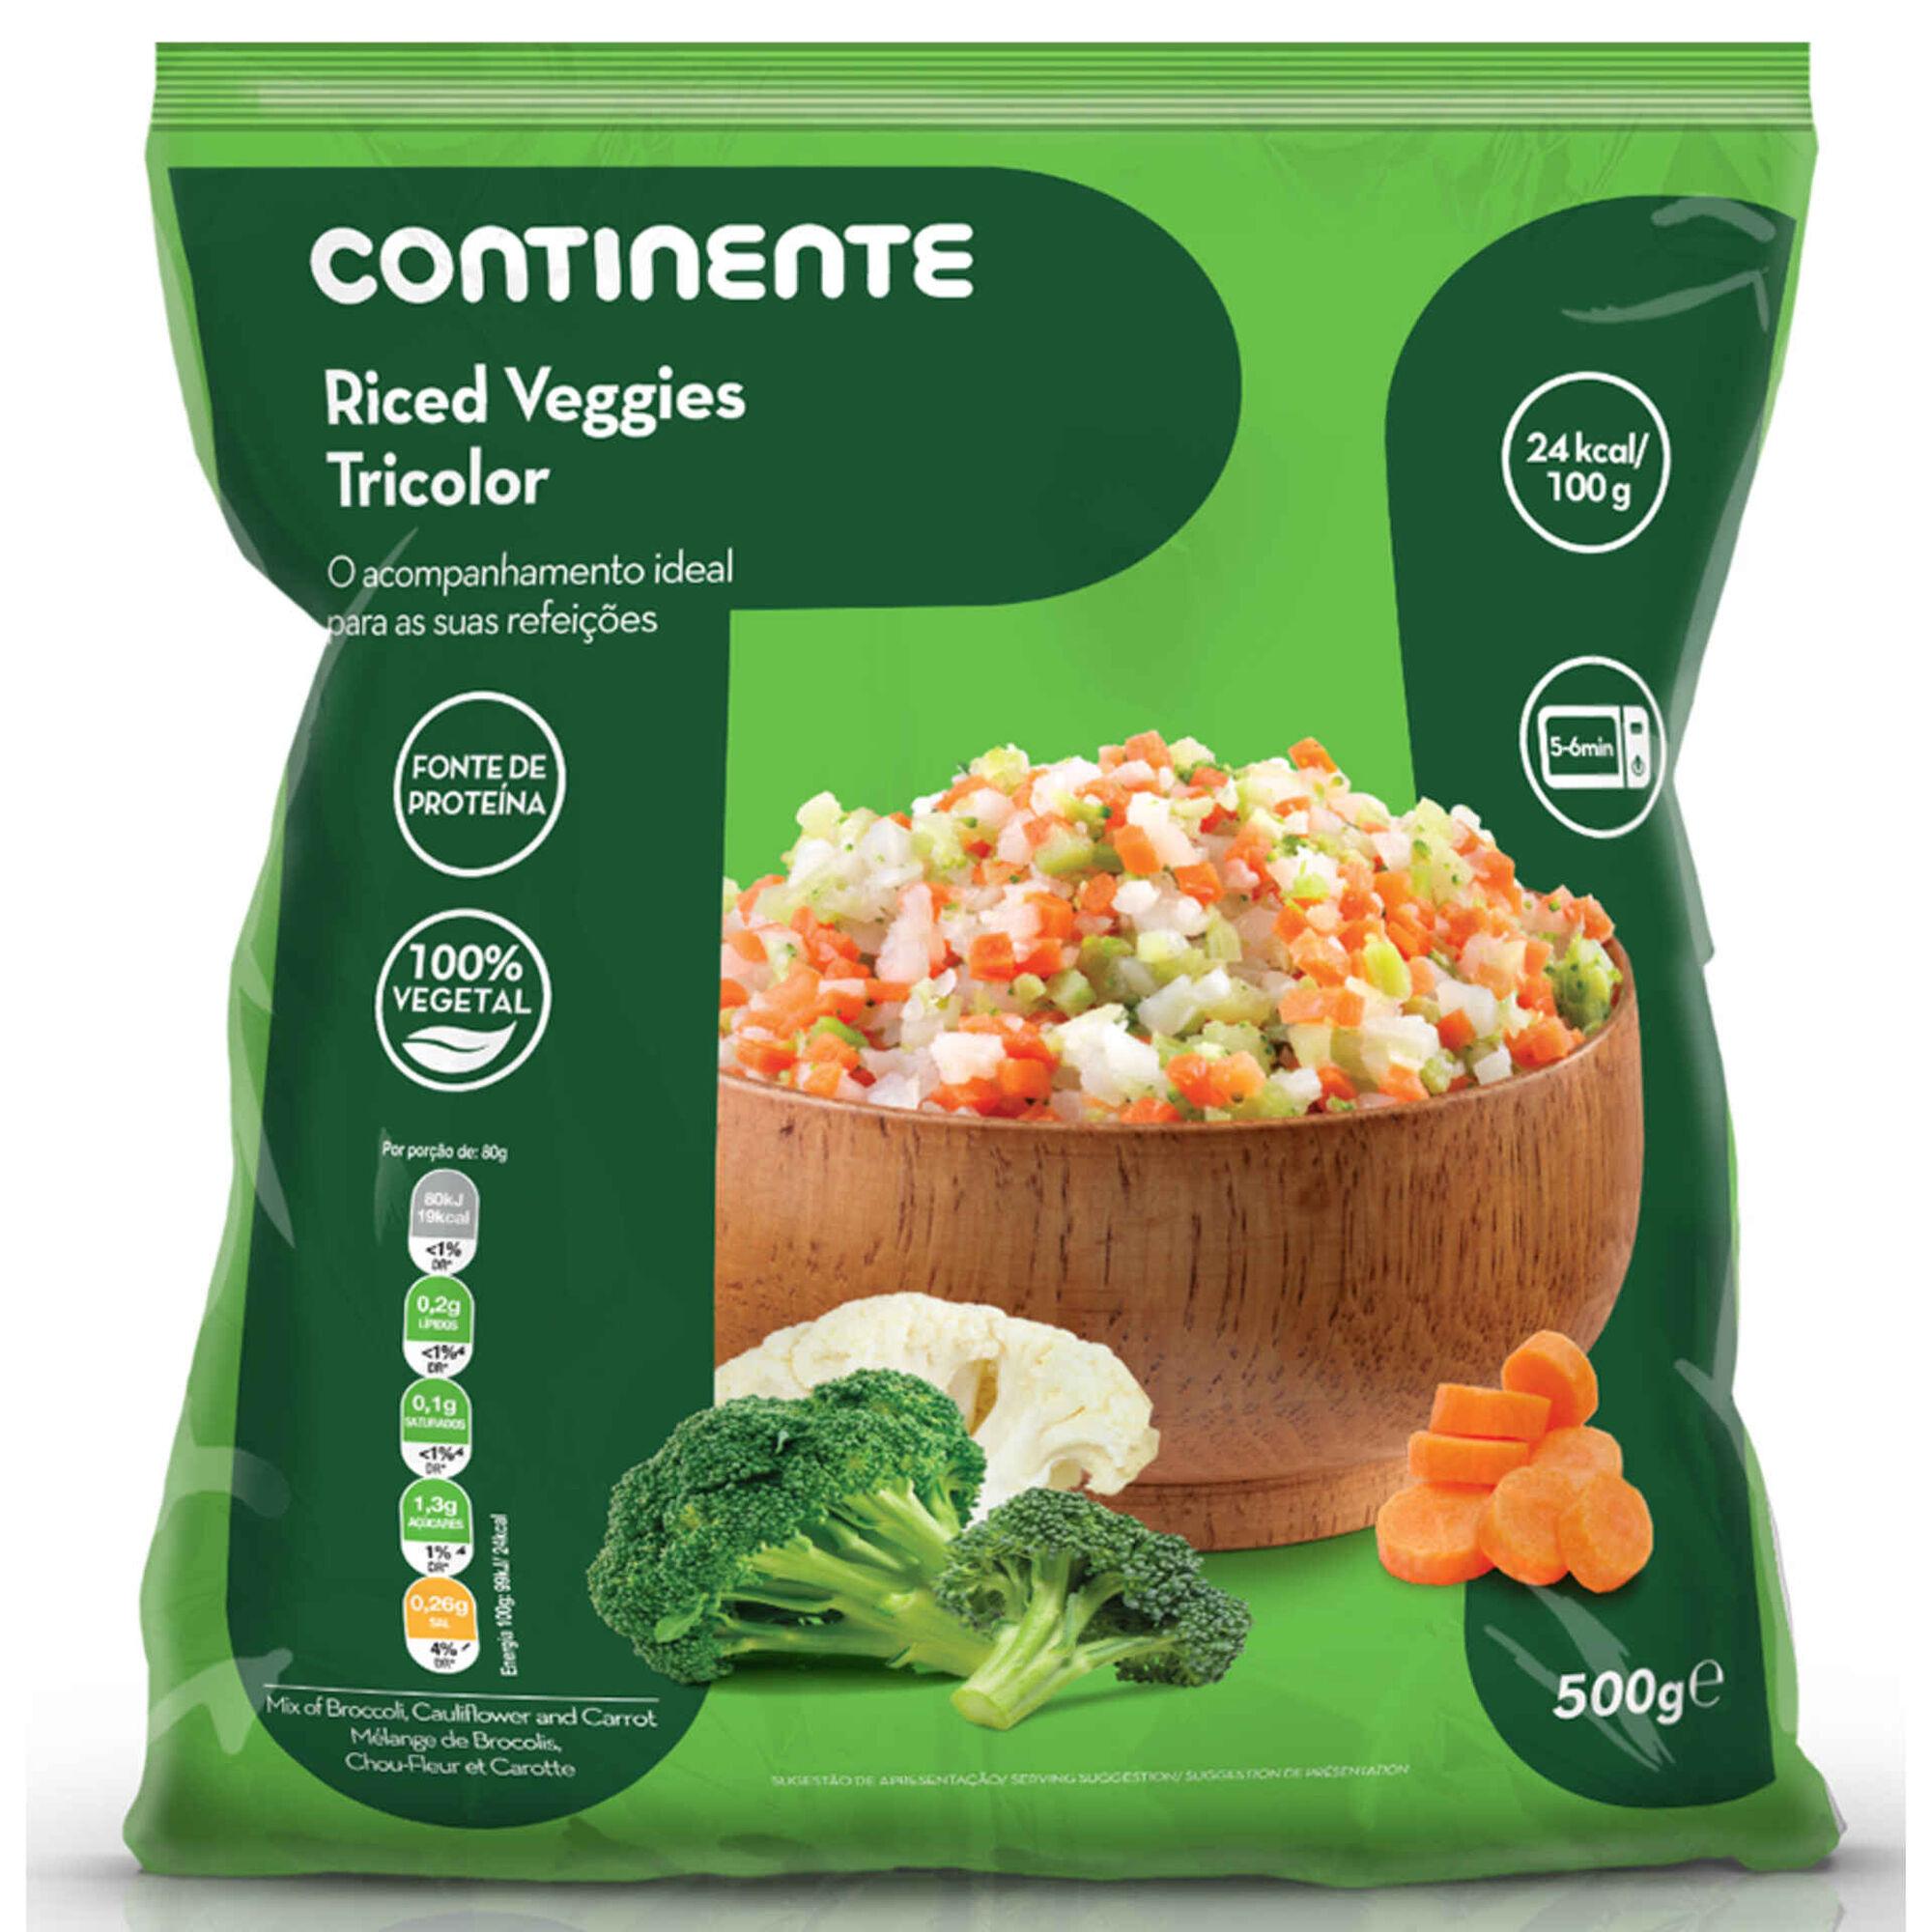 Riced Veggies Tricolor